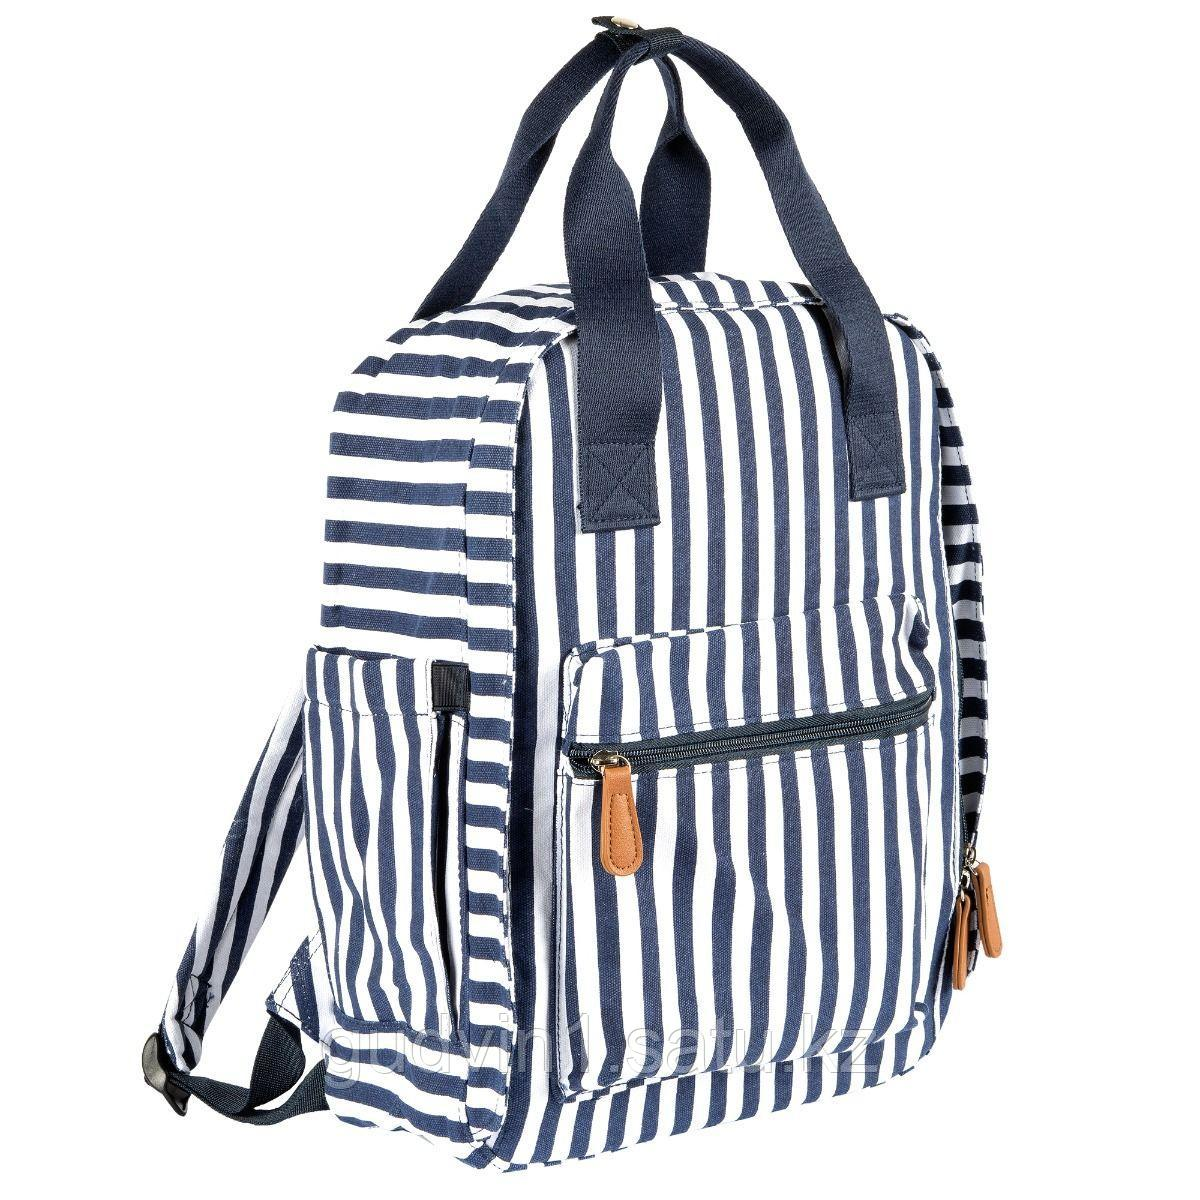 Chicco: Сумка-рюкзак для мамы в полоску син/бел  1160008